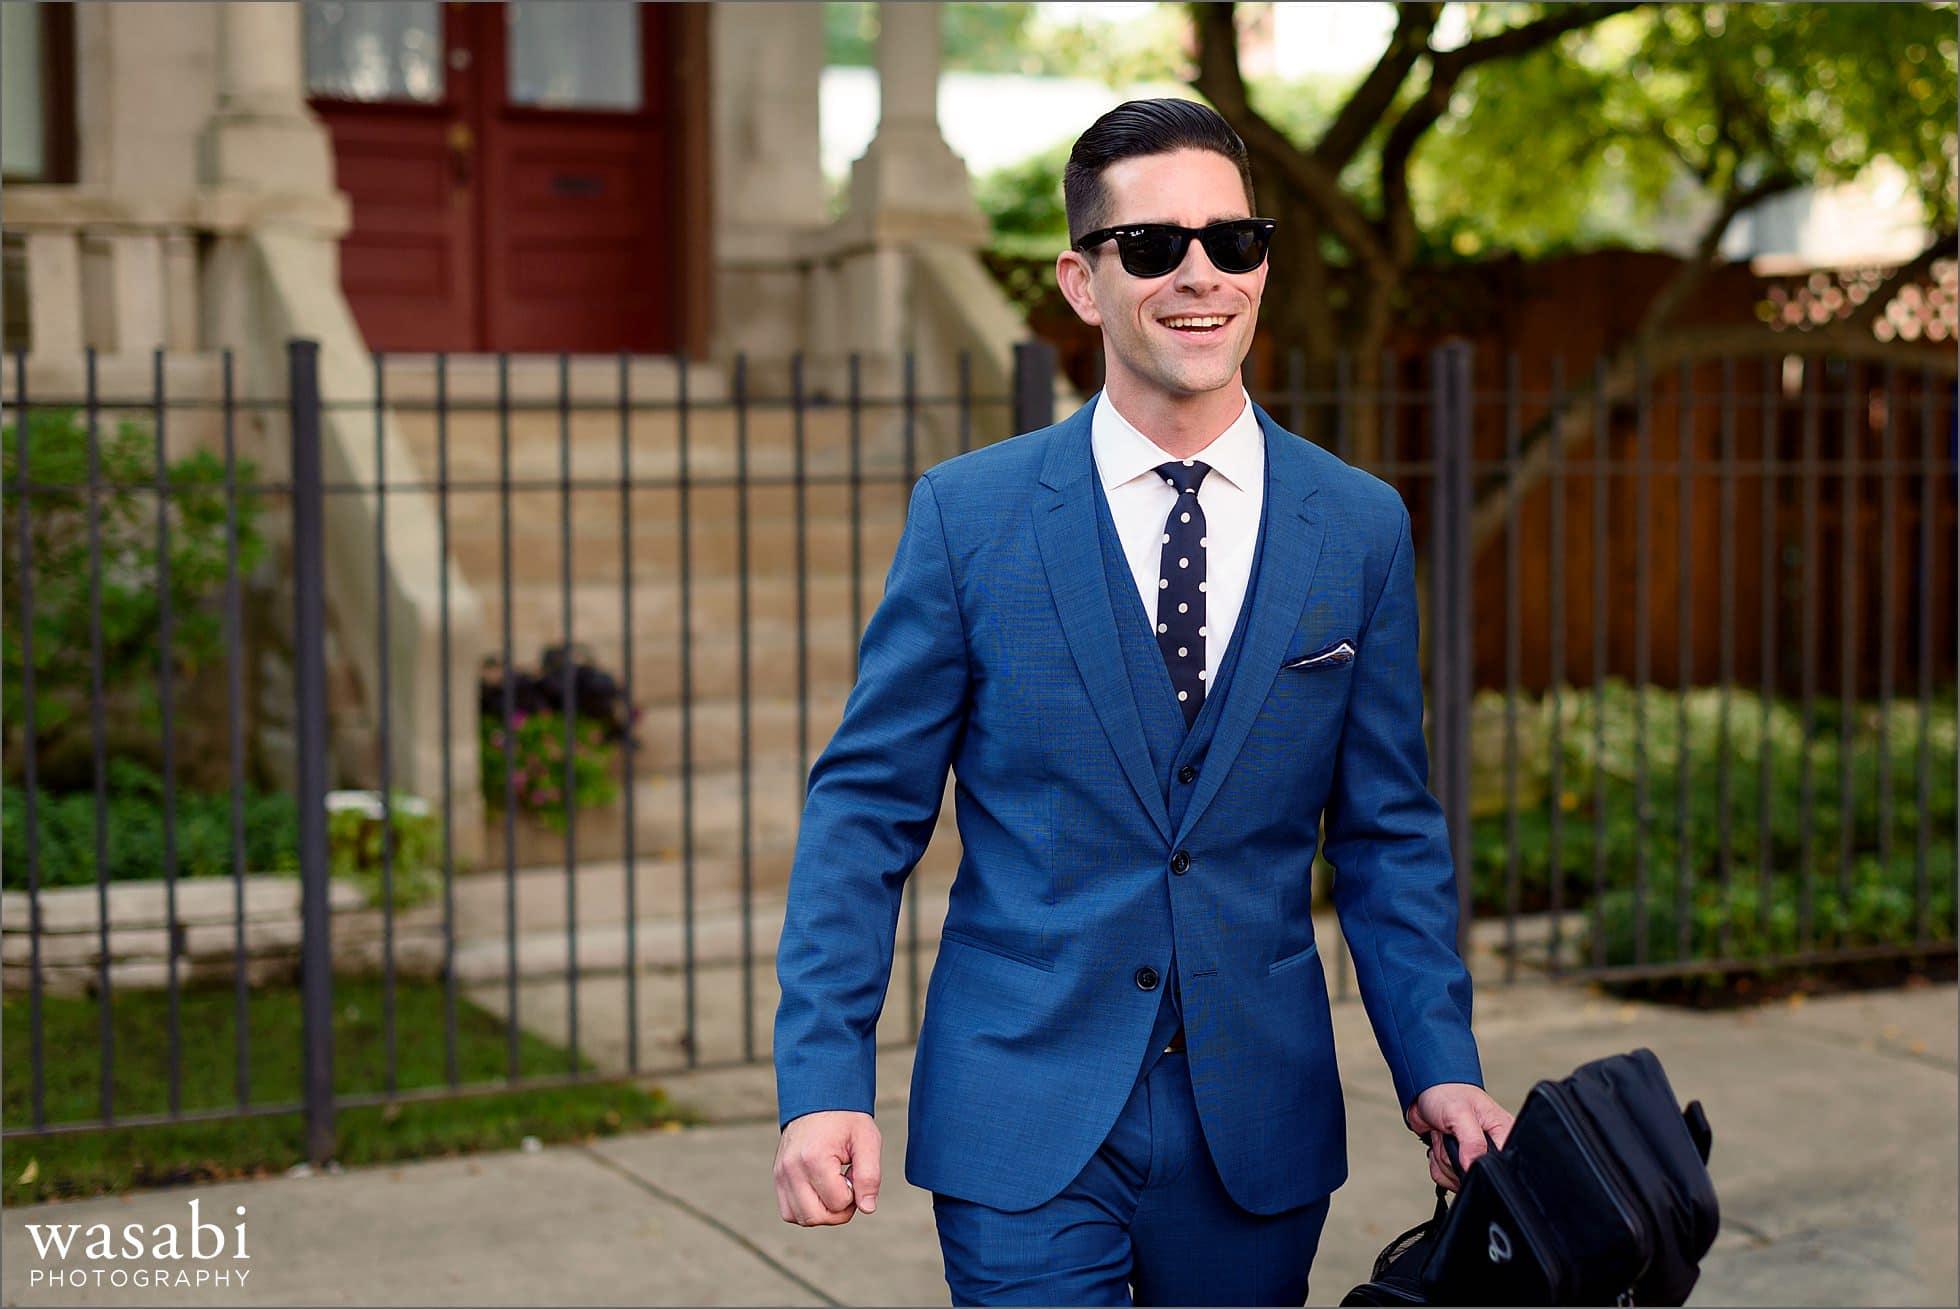 groom walking with guitar